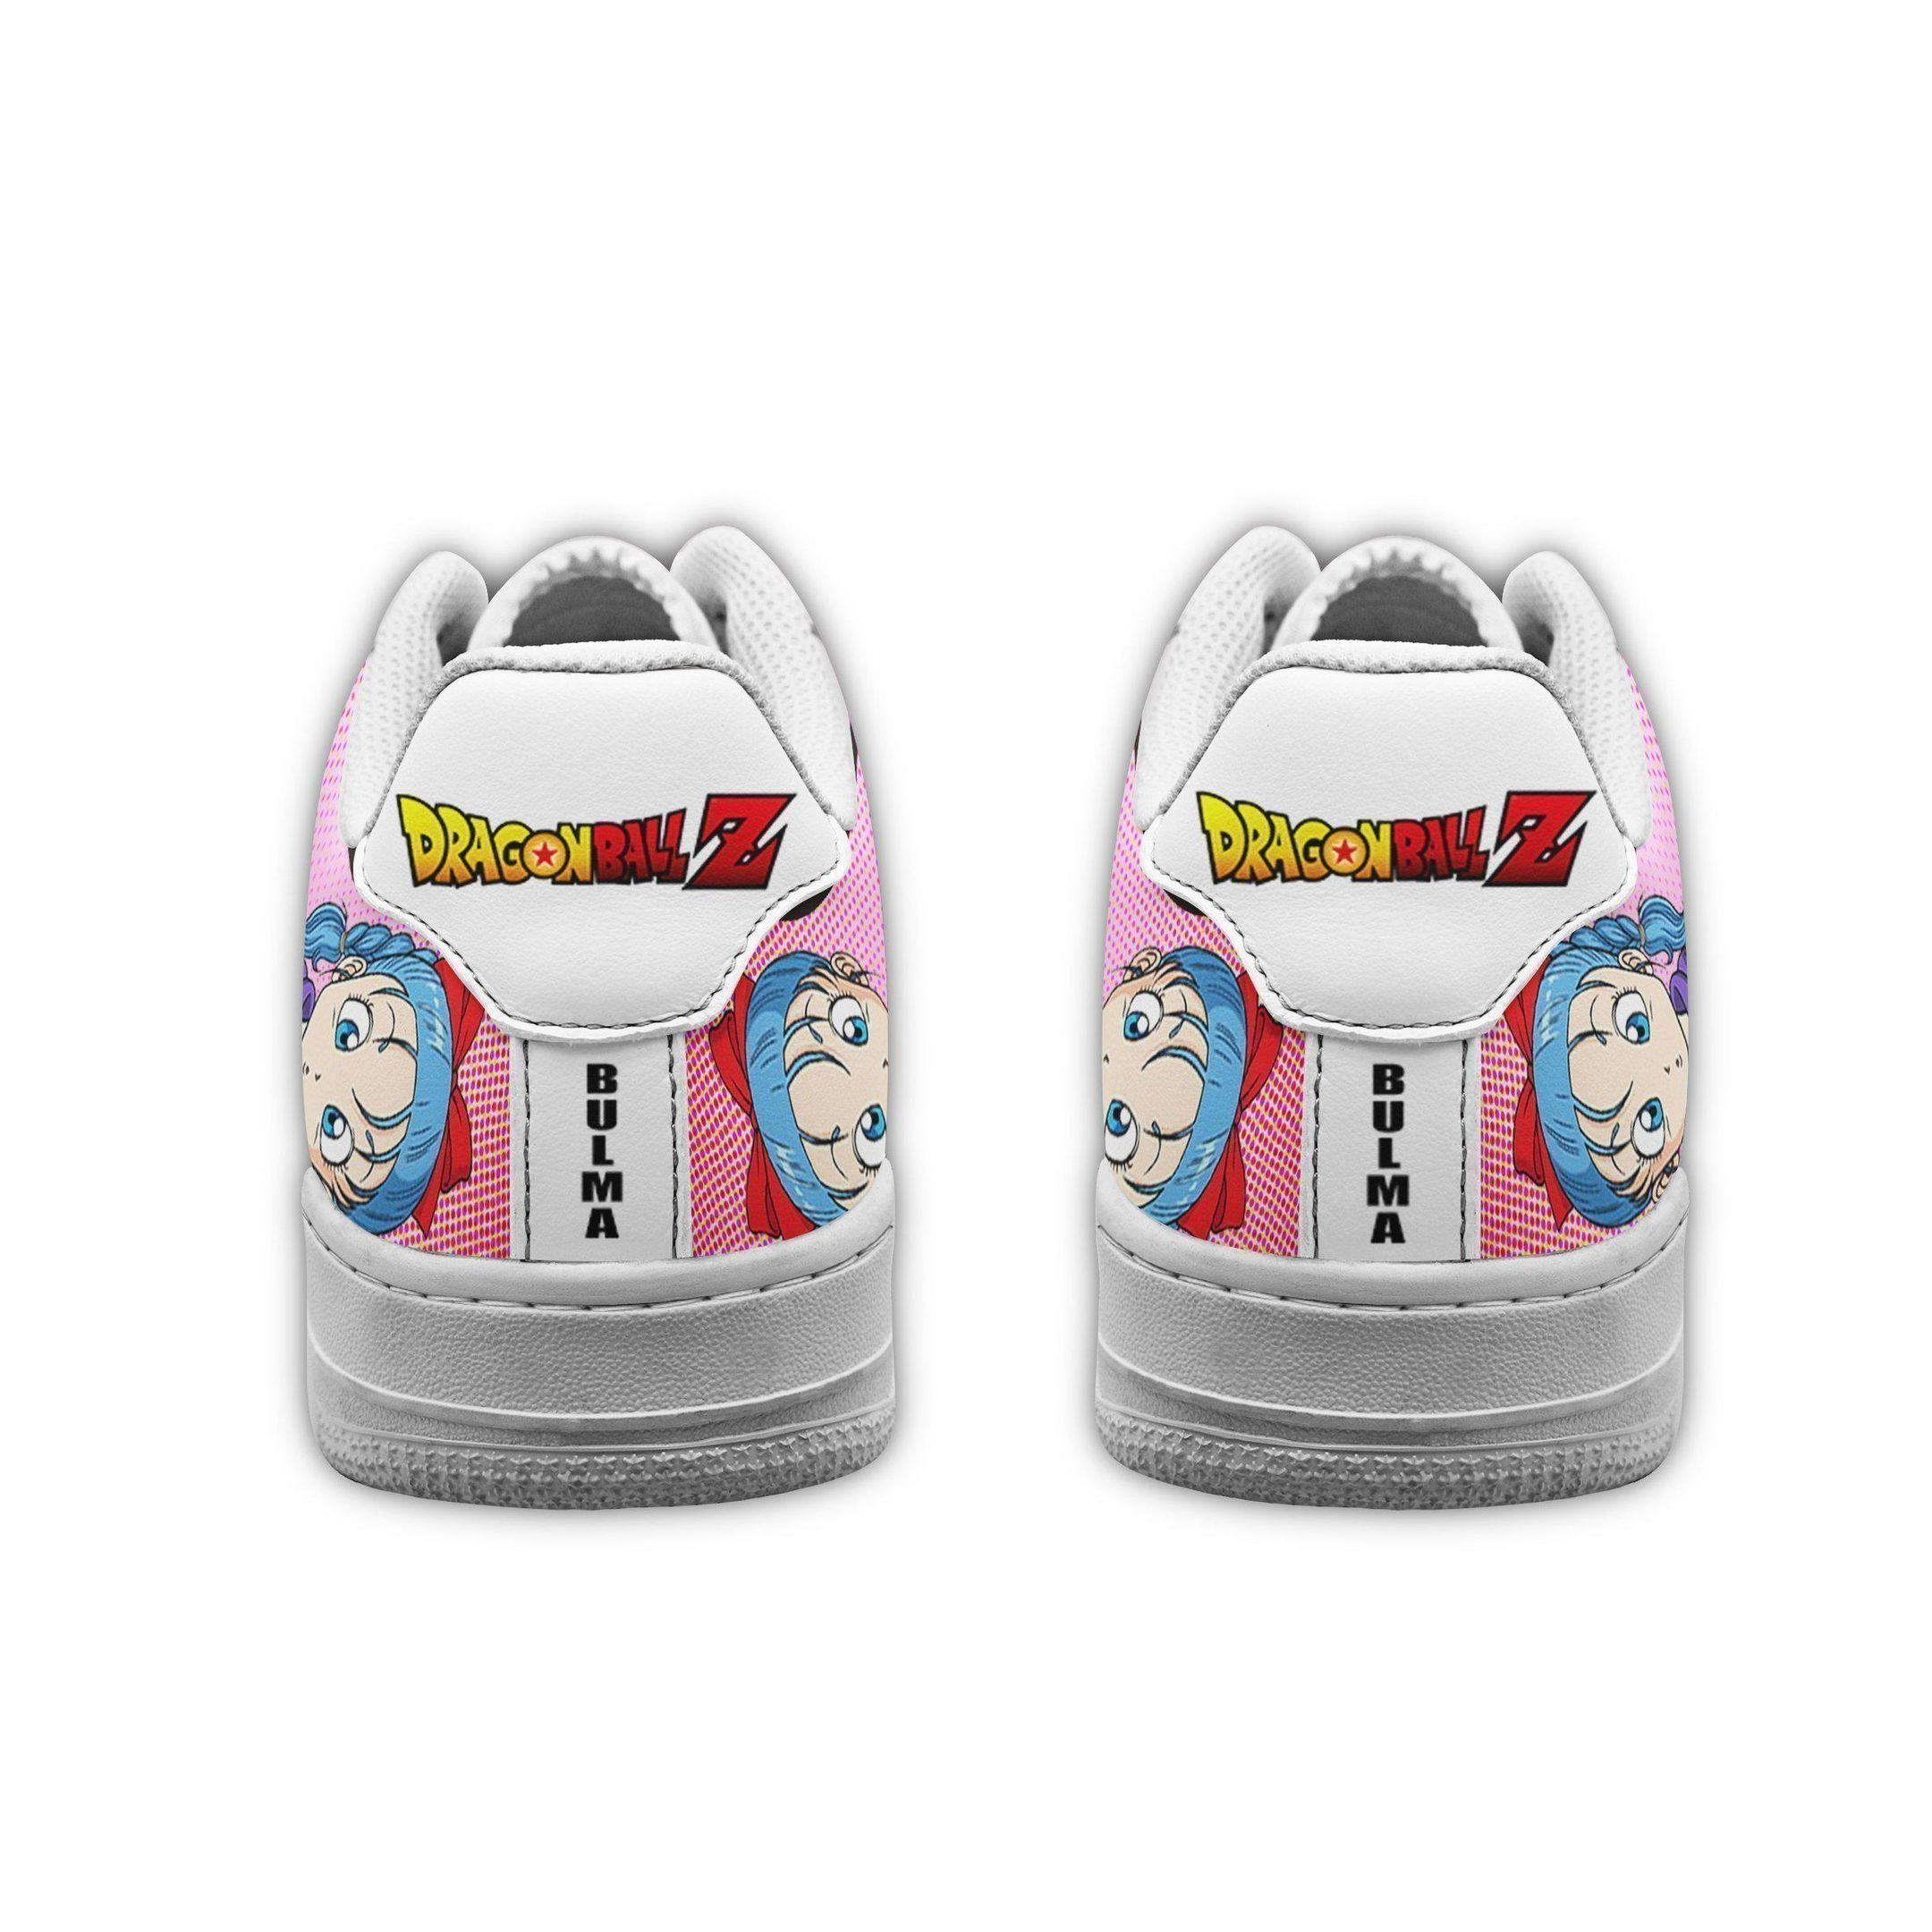 Bulma Air Shoes Dragon Ball Z Anime Shoes Fan Gift GO1012